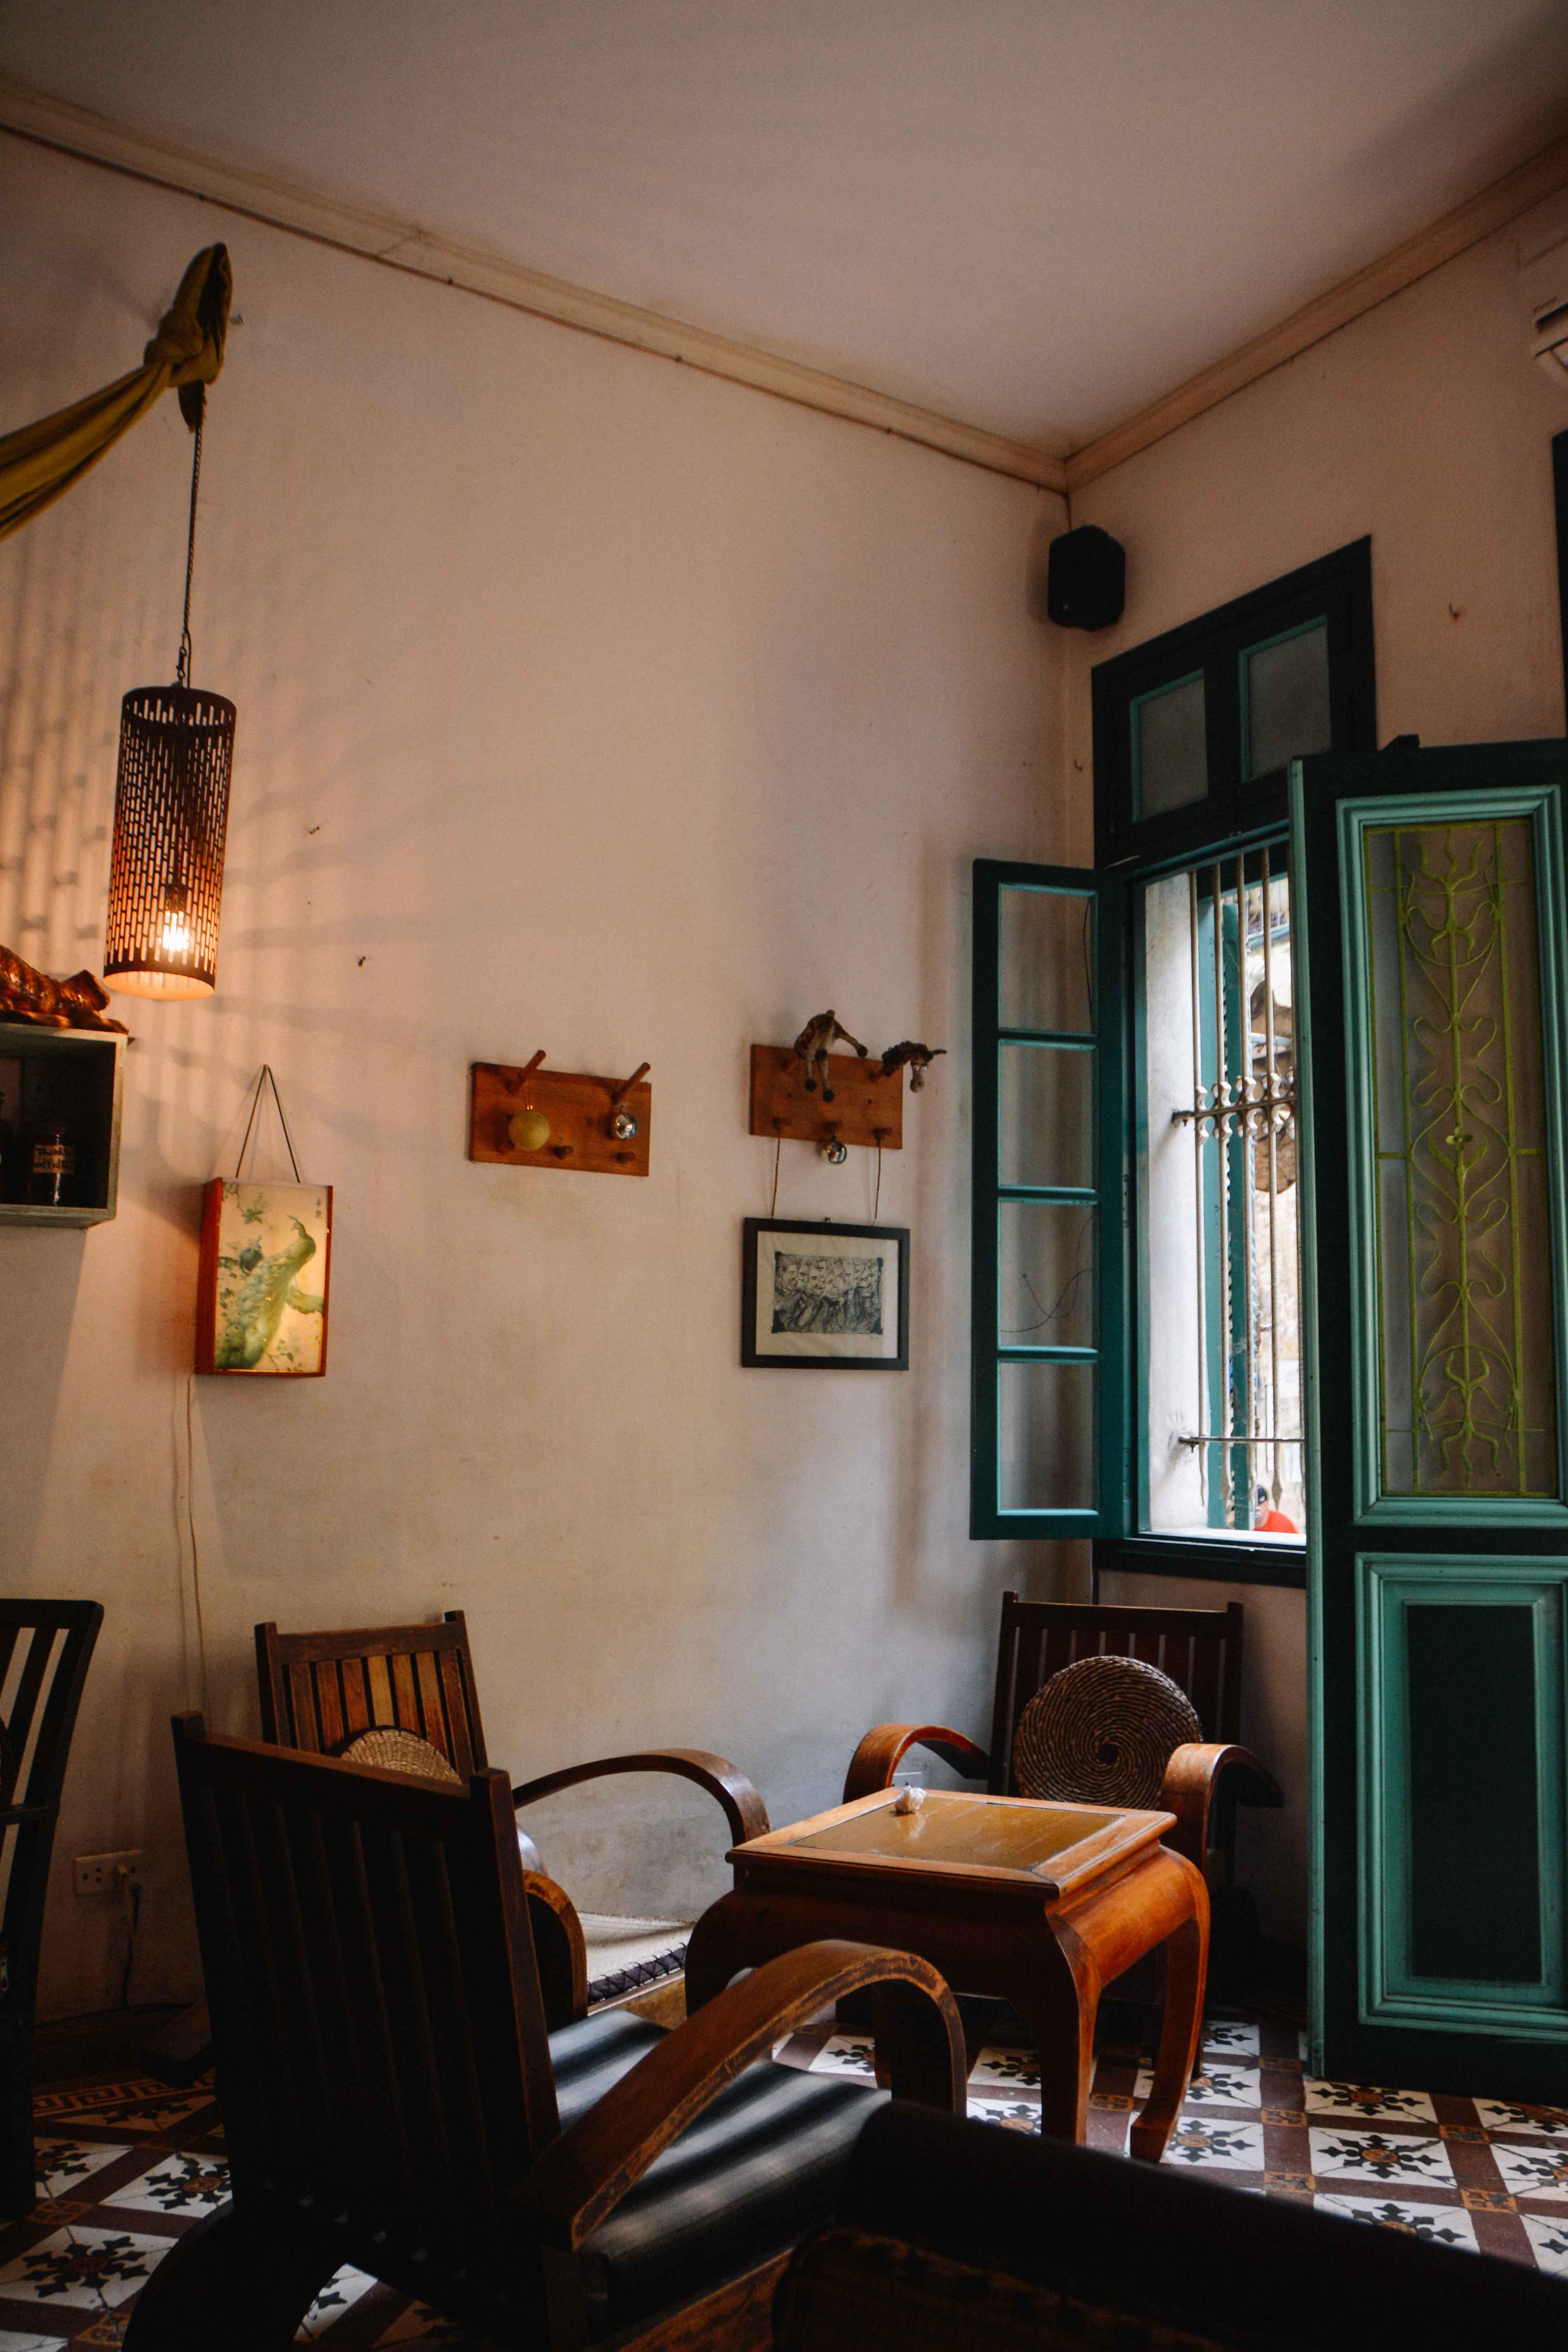 Hanoi social club, à Hanoi au Vietnam